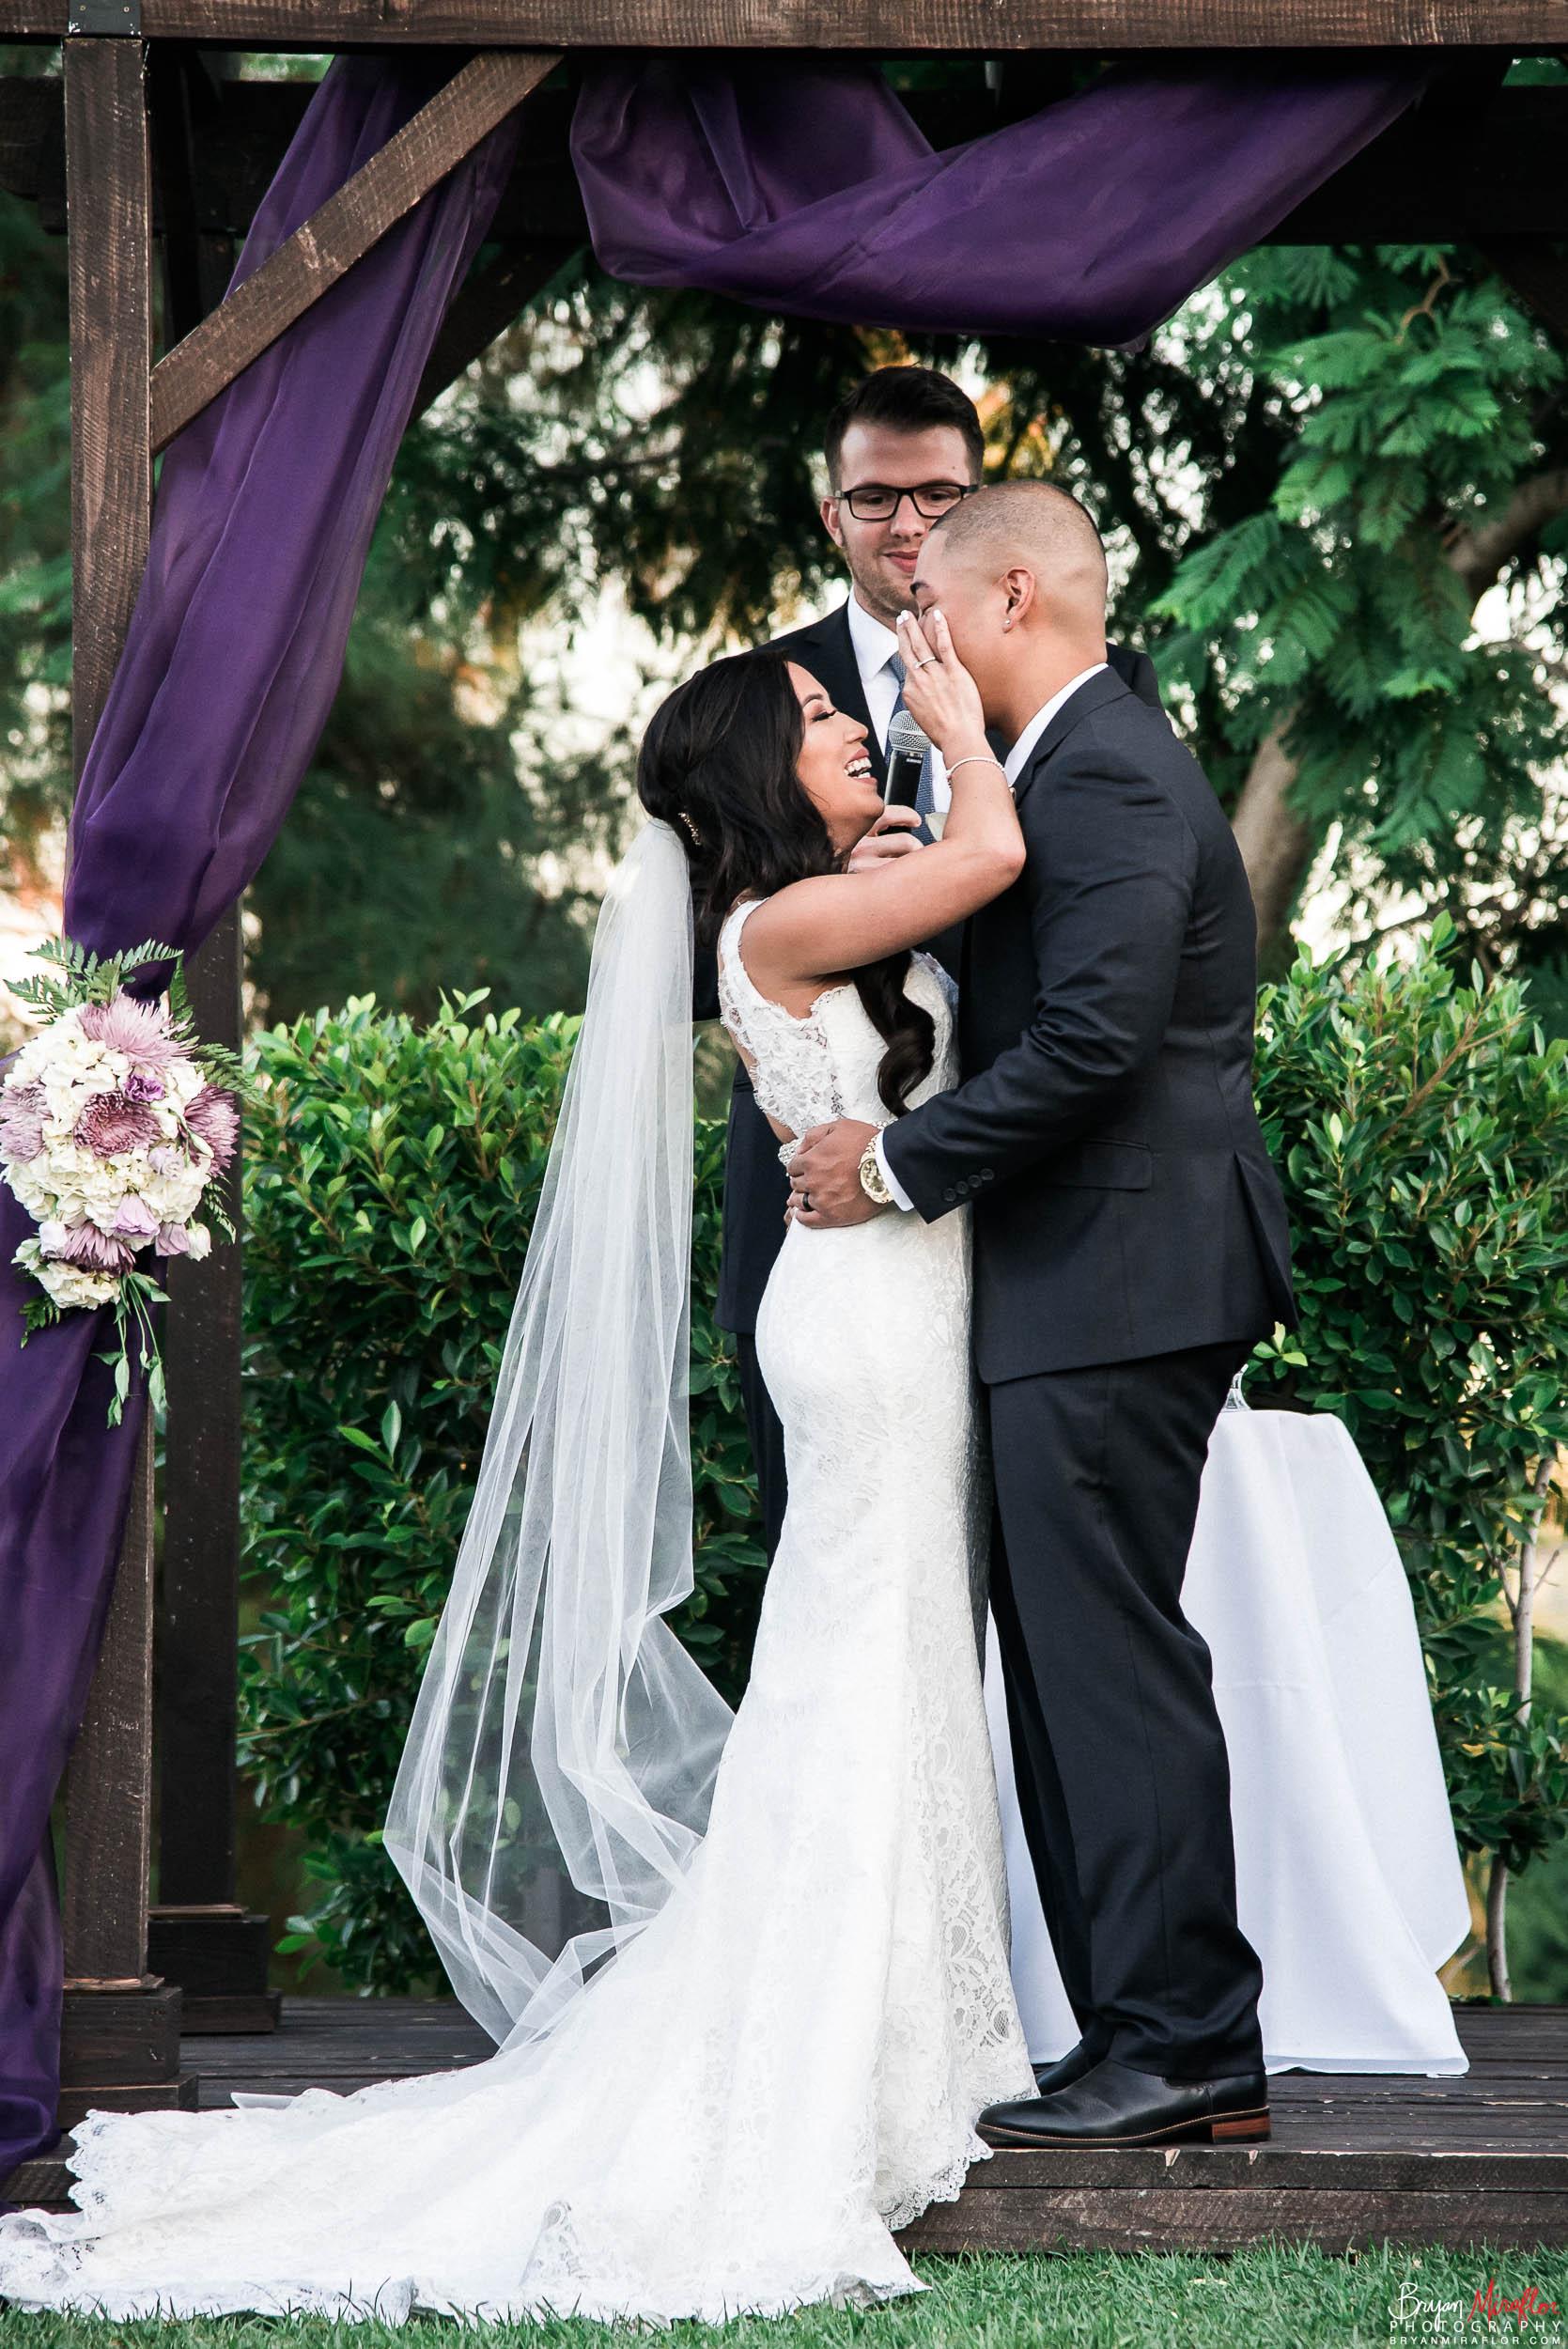 Bryan-Miraflor-Photography-Trisha-Dexter-Married-20170923-056.jpg